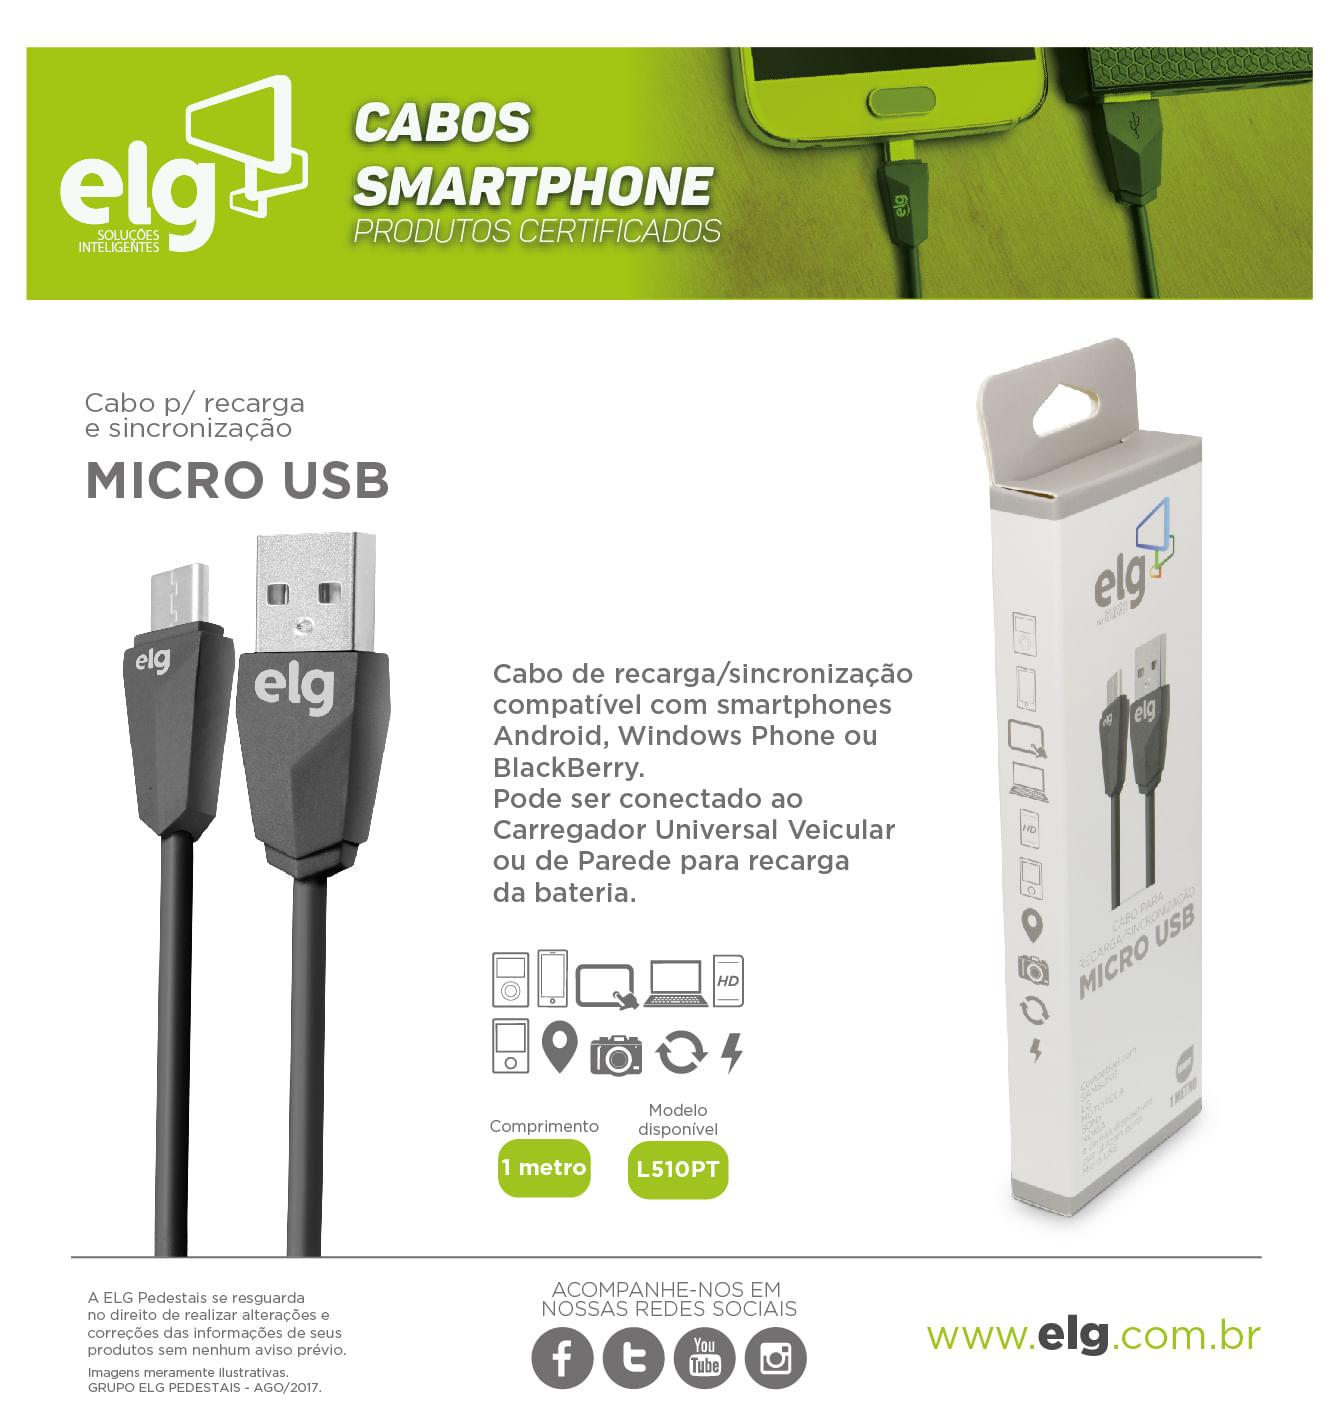 Cabo Micro USB 1 Metro Recarga Sincronização L510PT Preto - ELG Store